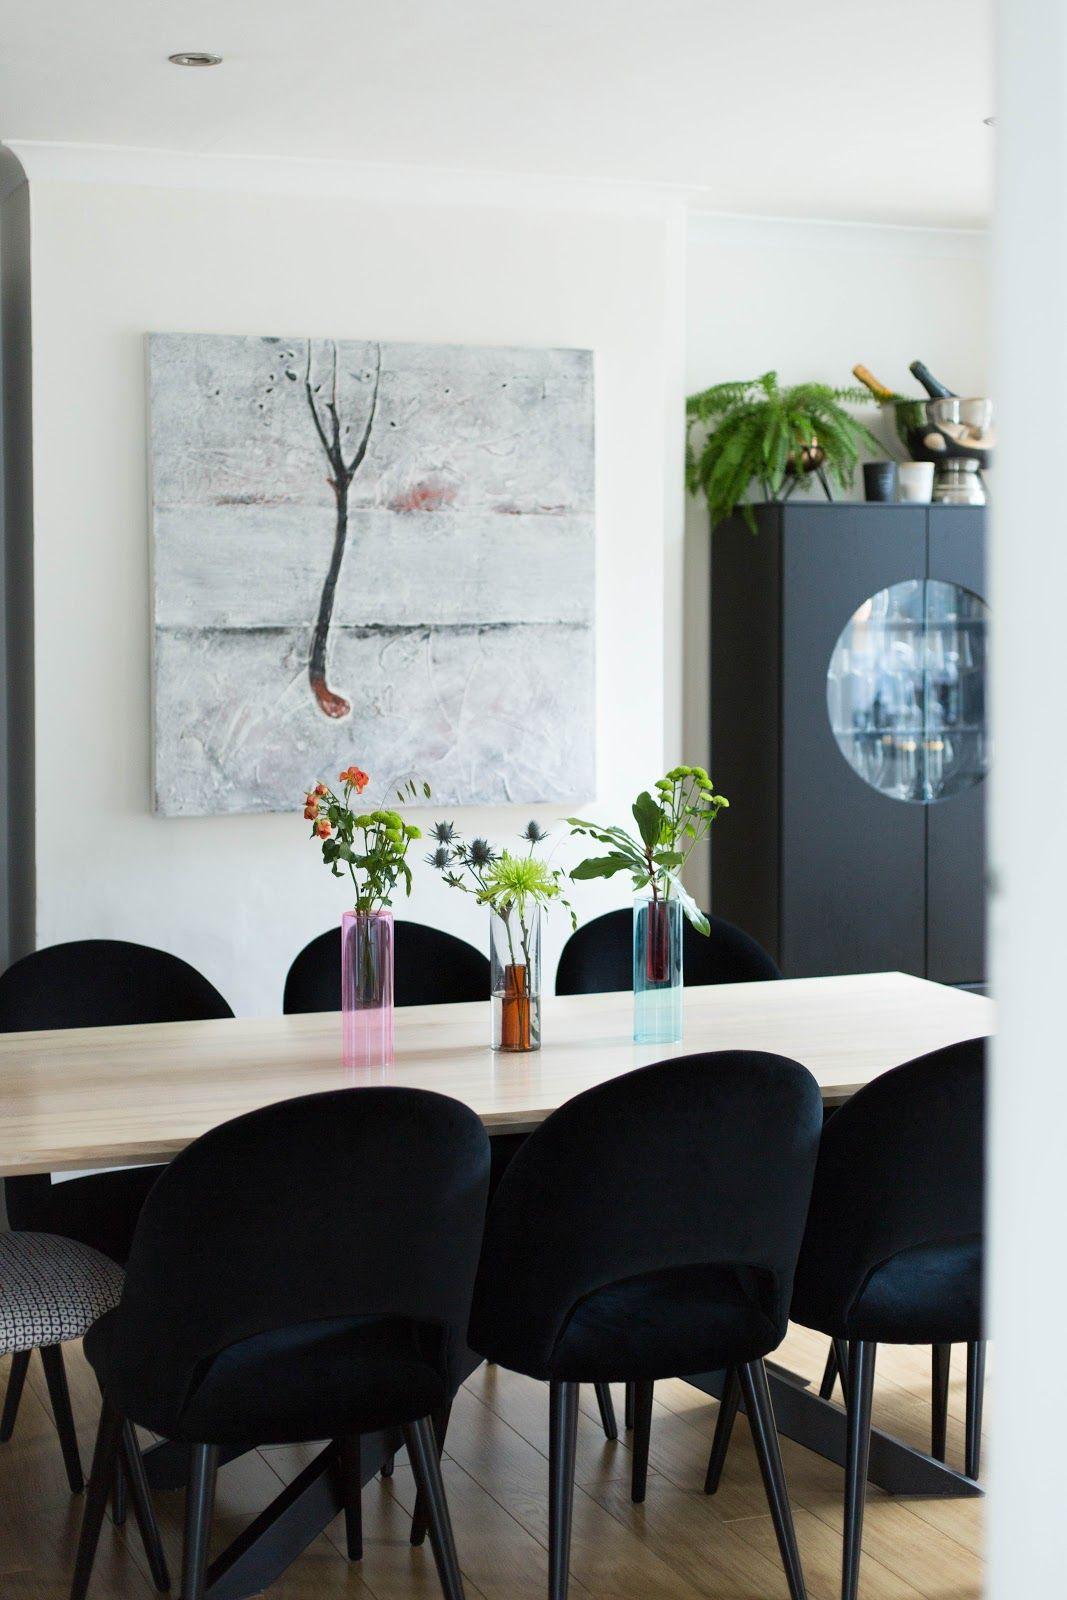 Ad Reversible Glass Vases By Block Design Modern Flower Arrangements Dining Table Minimalist Decor